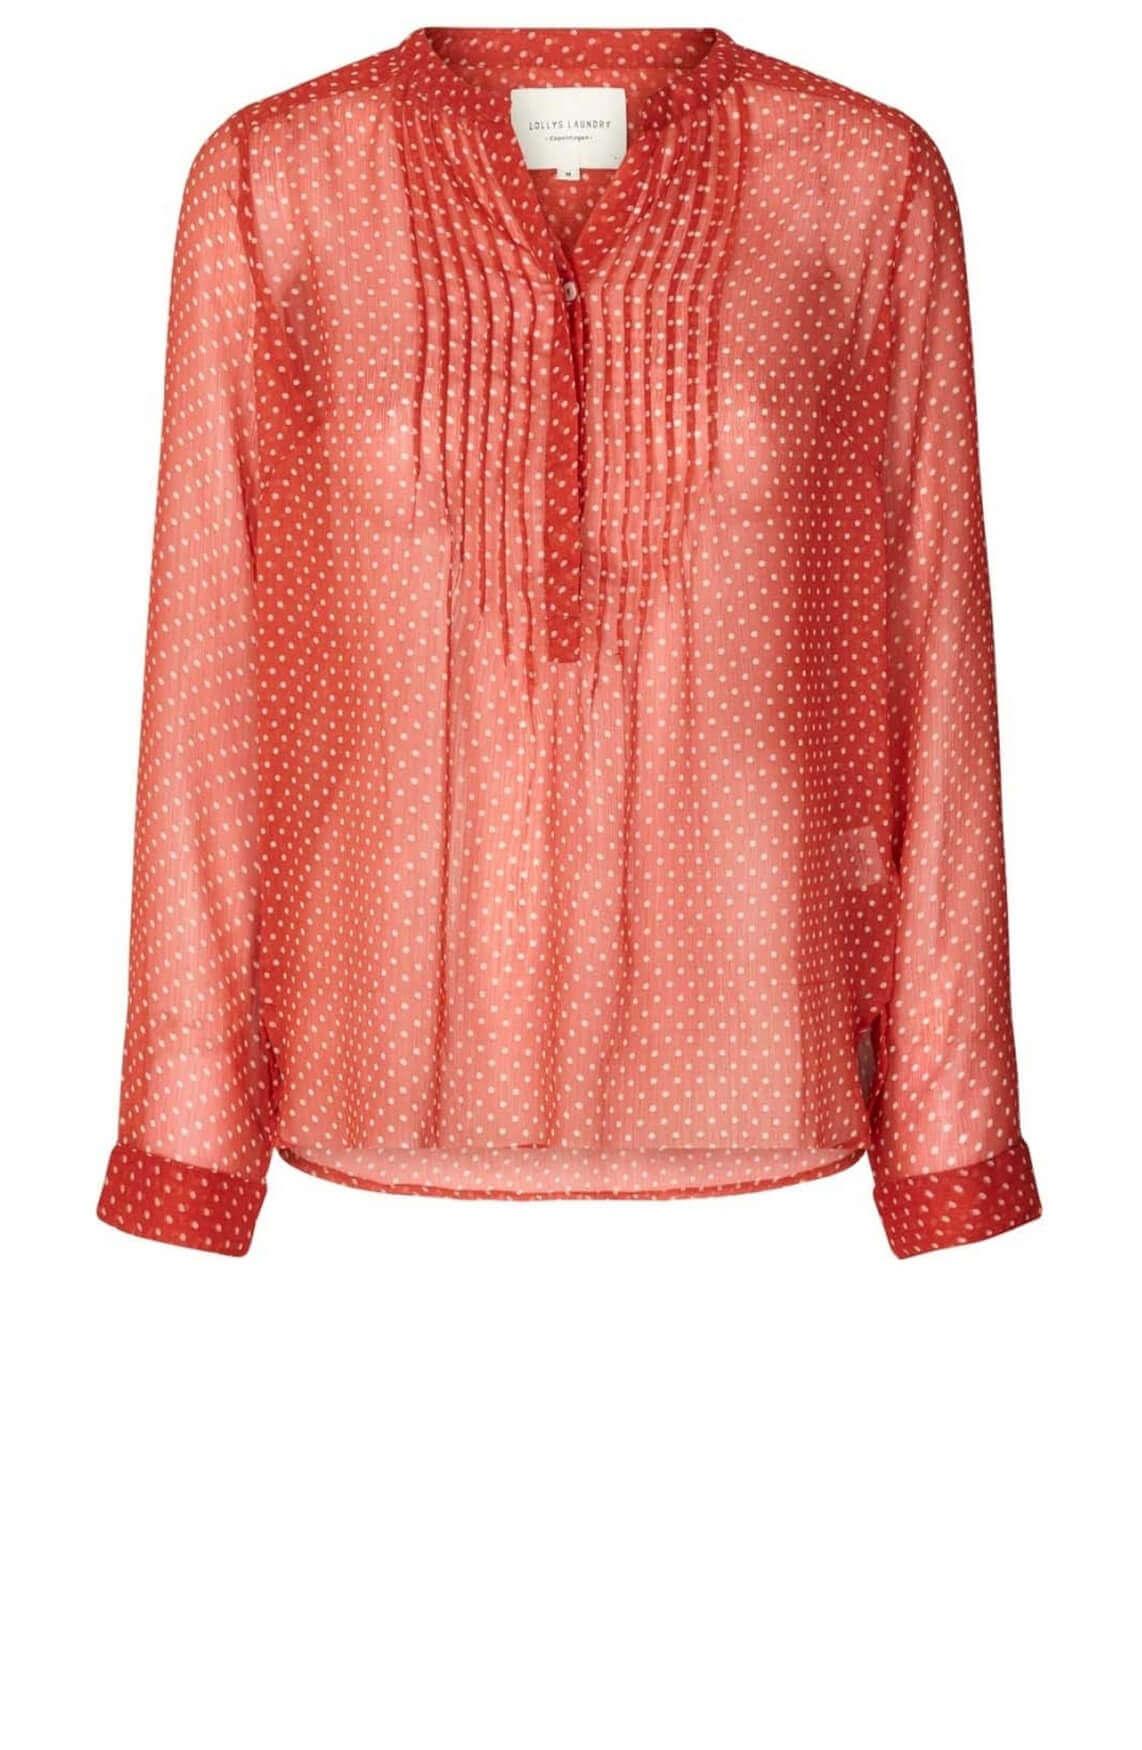 Lollys Laundry Dames Helena gestippelde blouse Rood